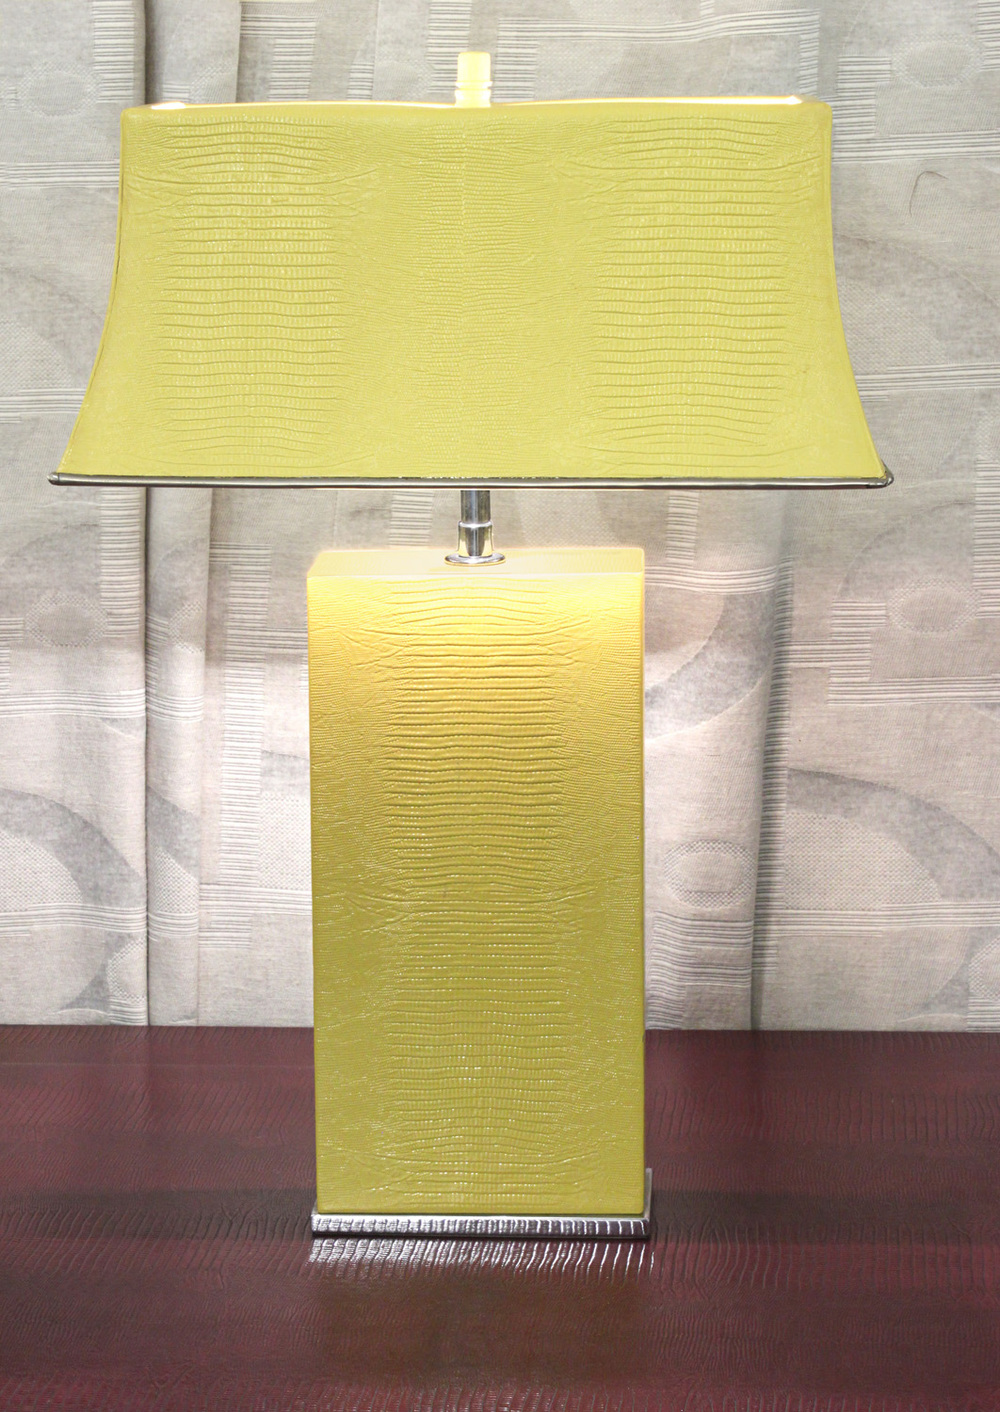 Springer 65 yellow lizard+shade tablelamp227 detail6 hires.jpg